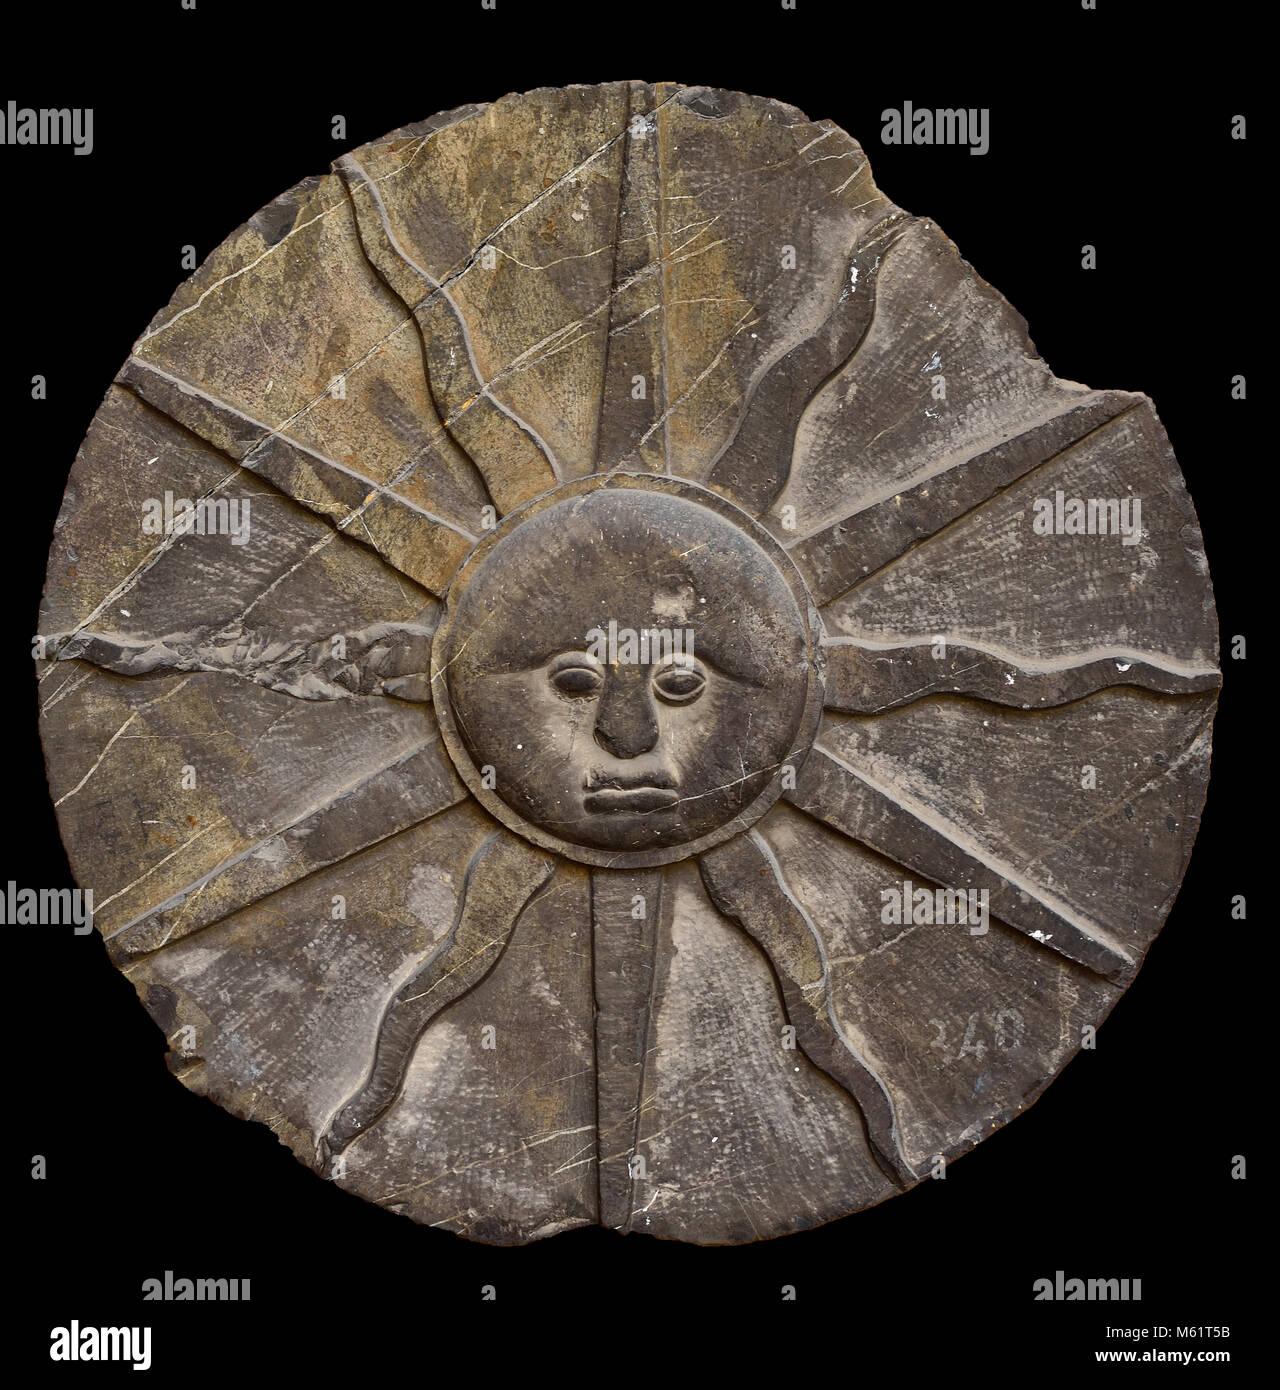 Emblema Solar - Solar Emblem  18th,century, Spain, Spanish, - Stock Image